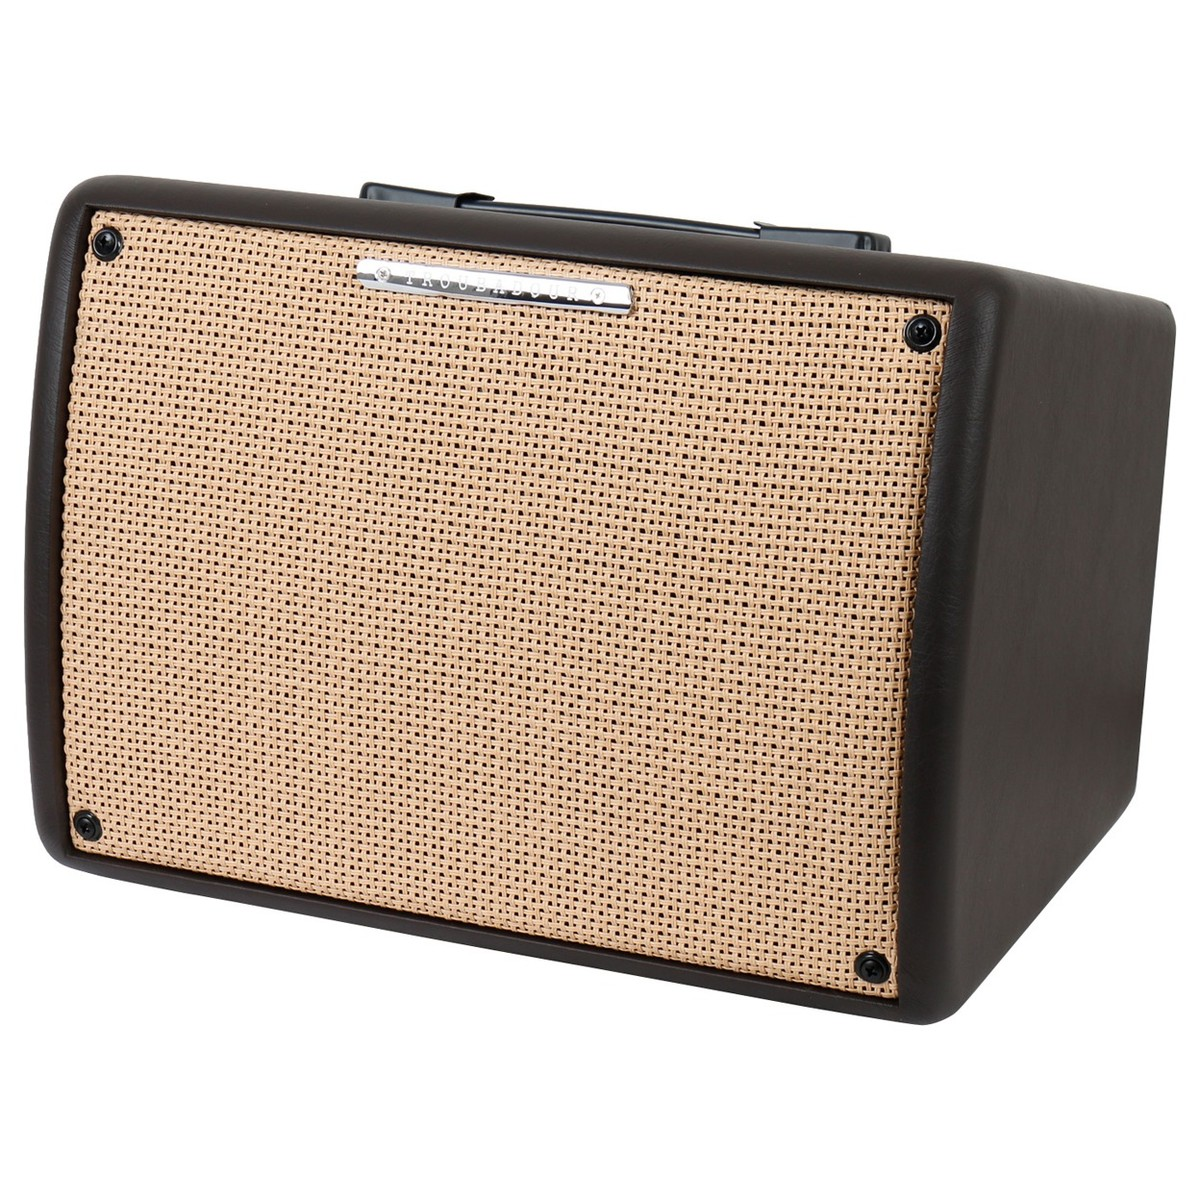 hight resolution of ibanez troubadour t30 ii acoustic guitar combo amp